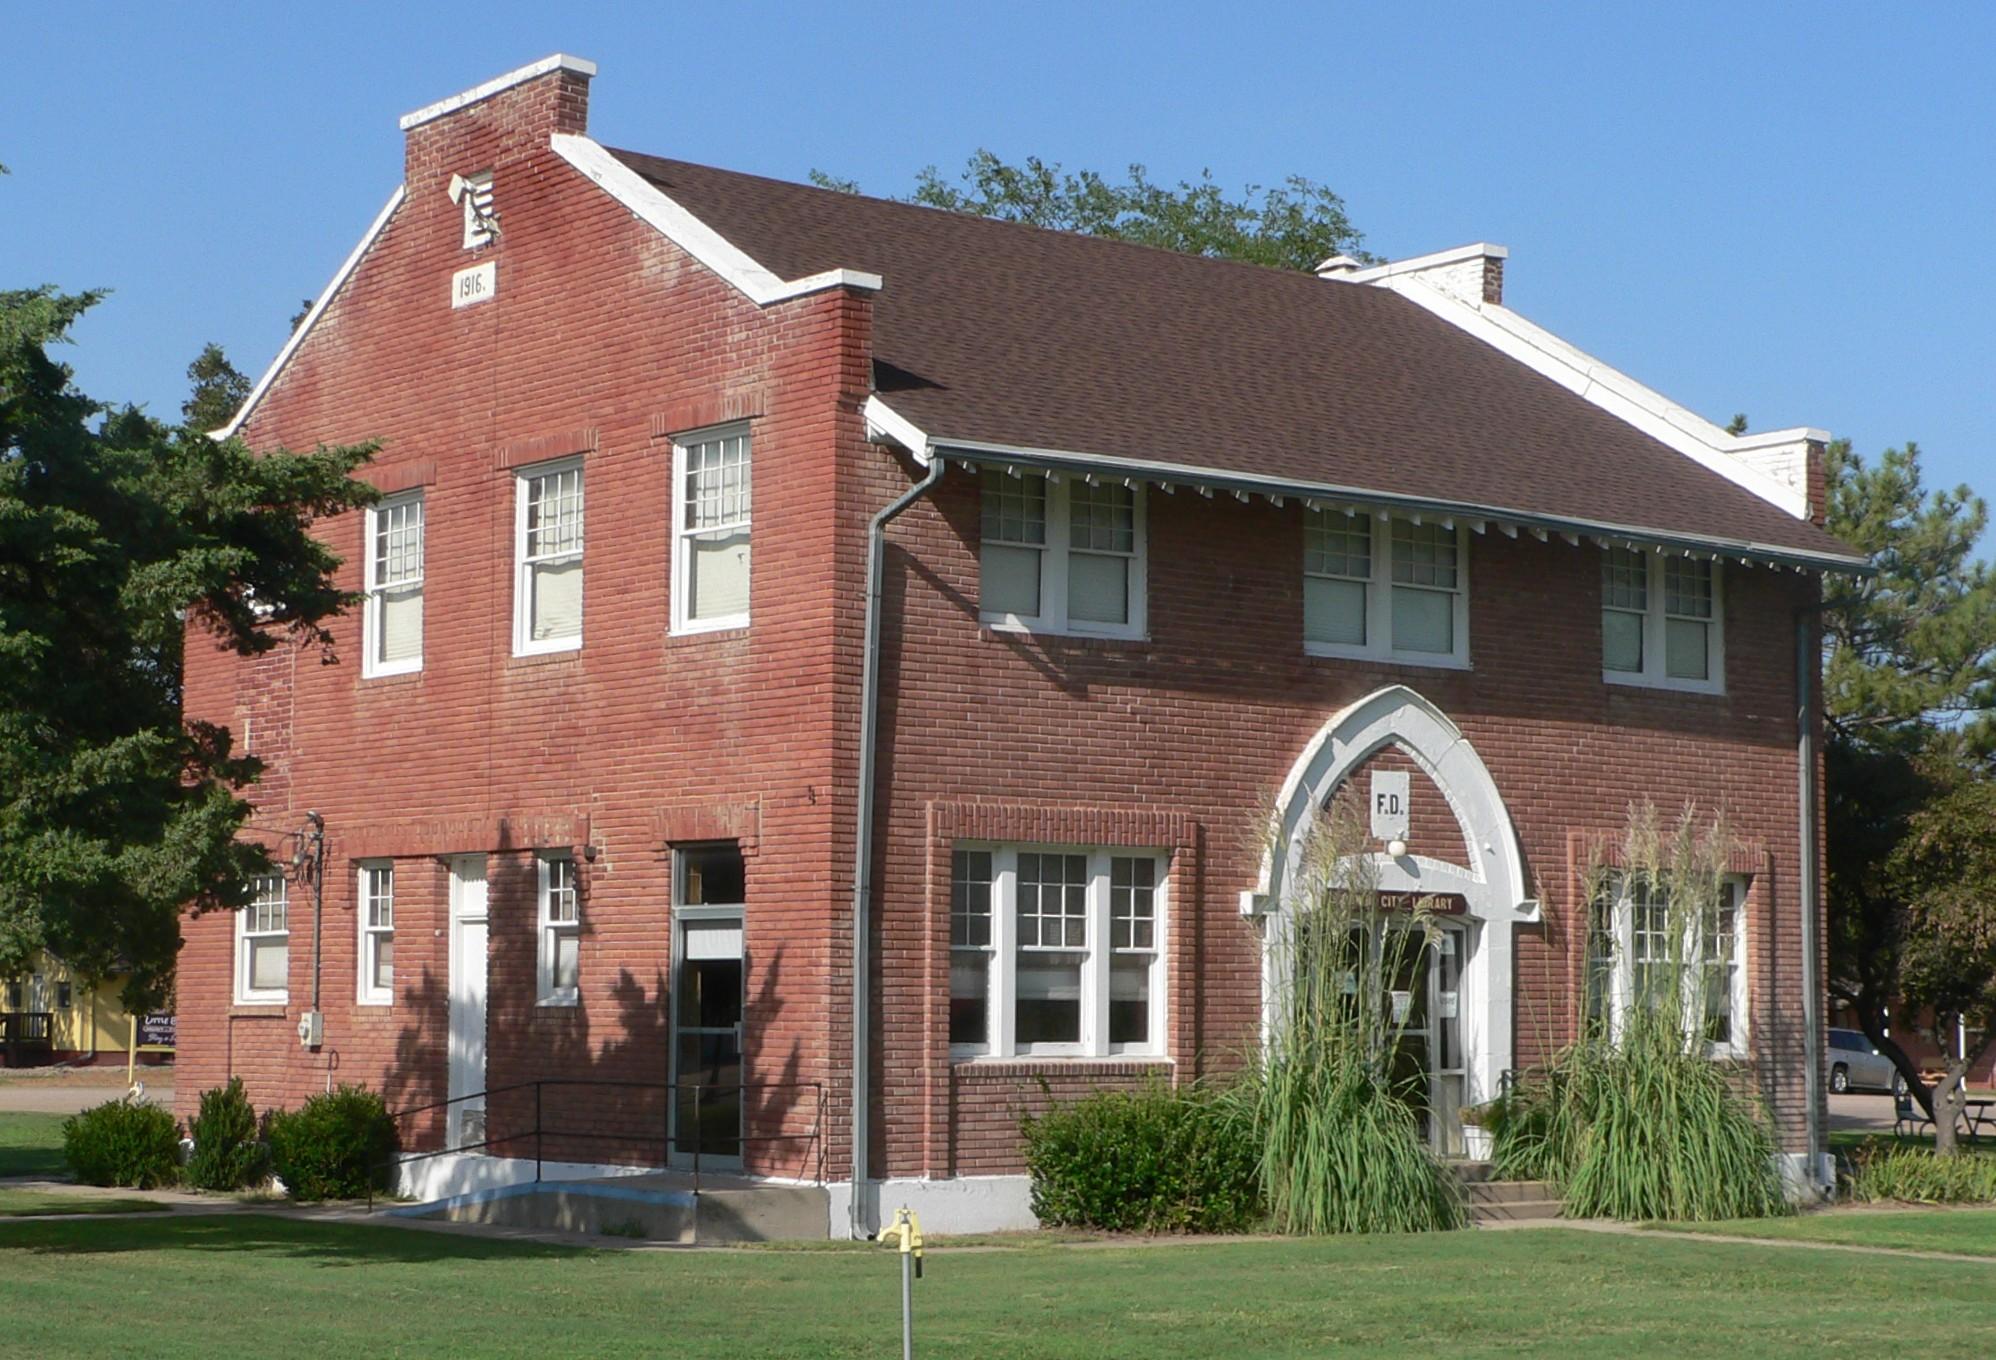 Kansas phillips county kirwin - File Kirwin Kansas City Hall From Sw 1 Jpg